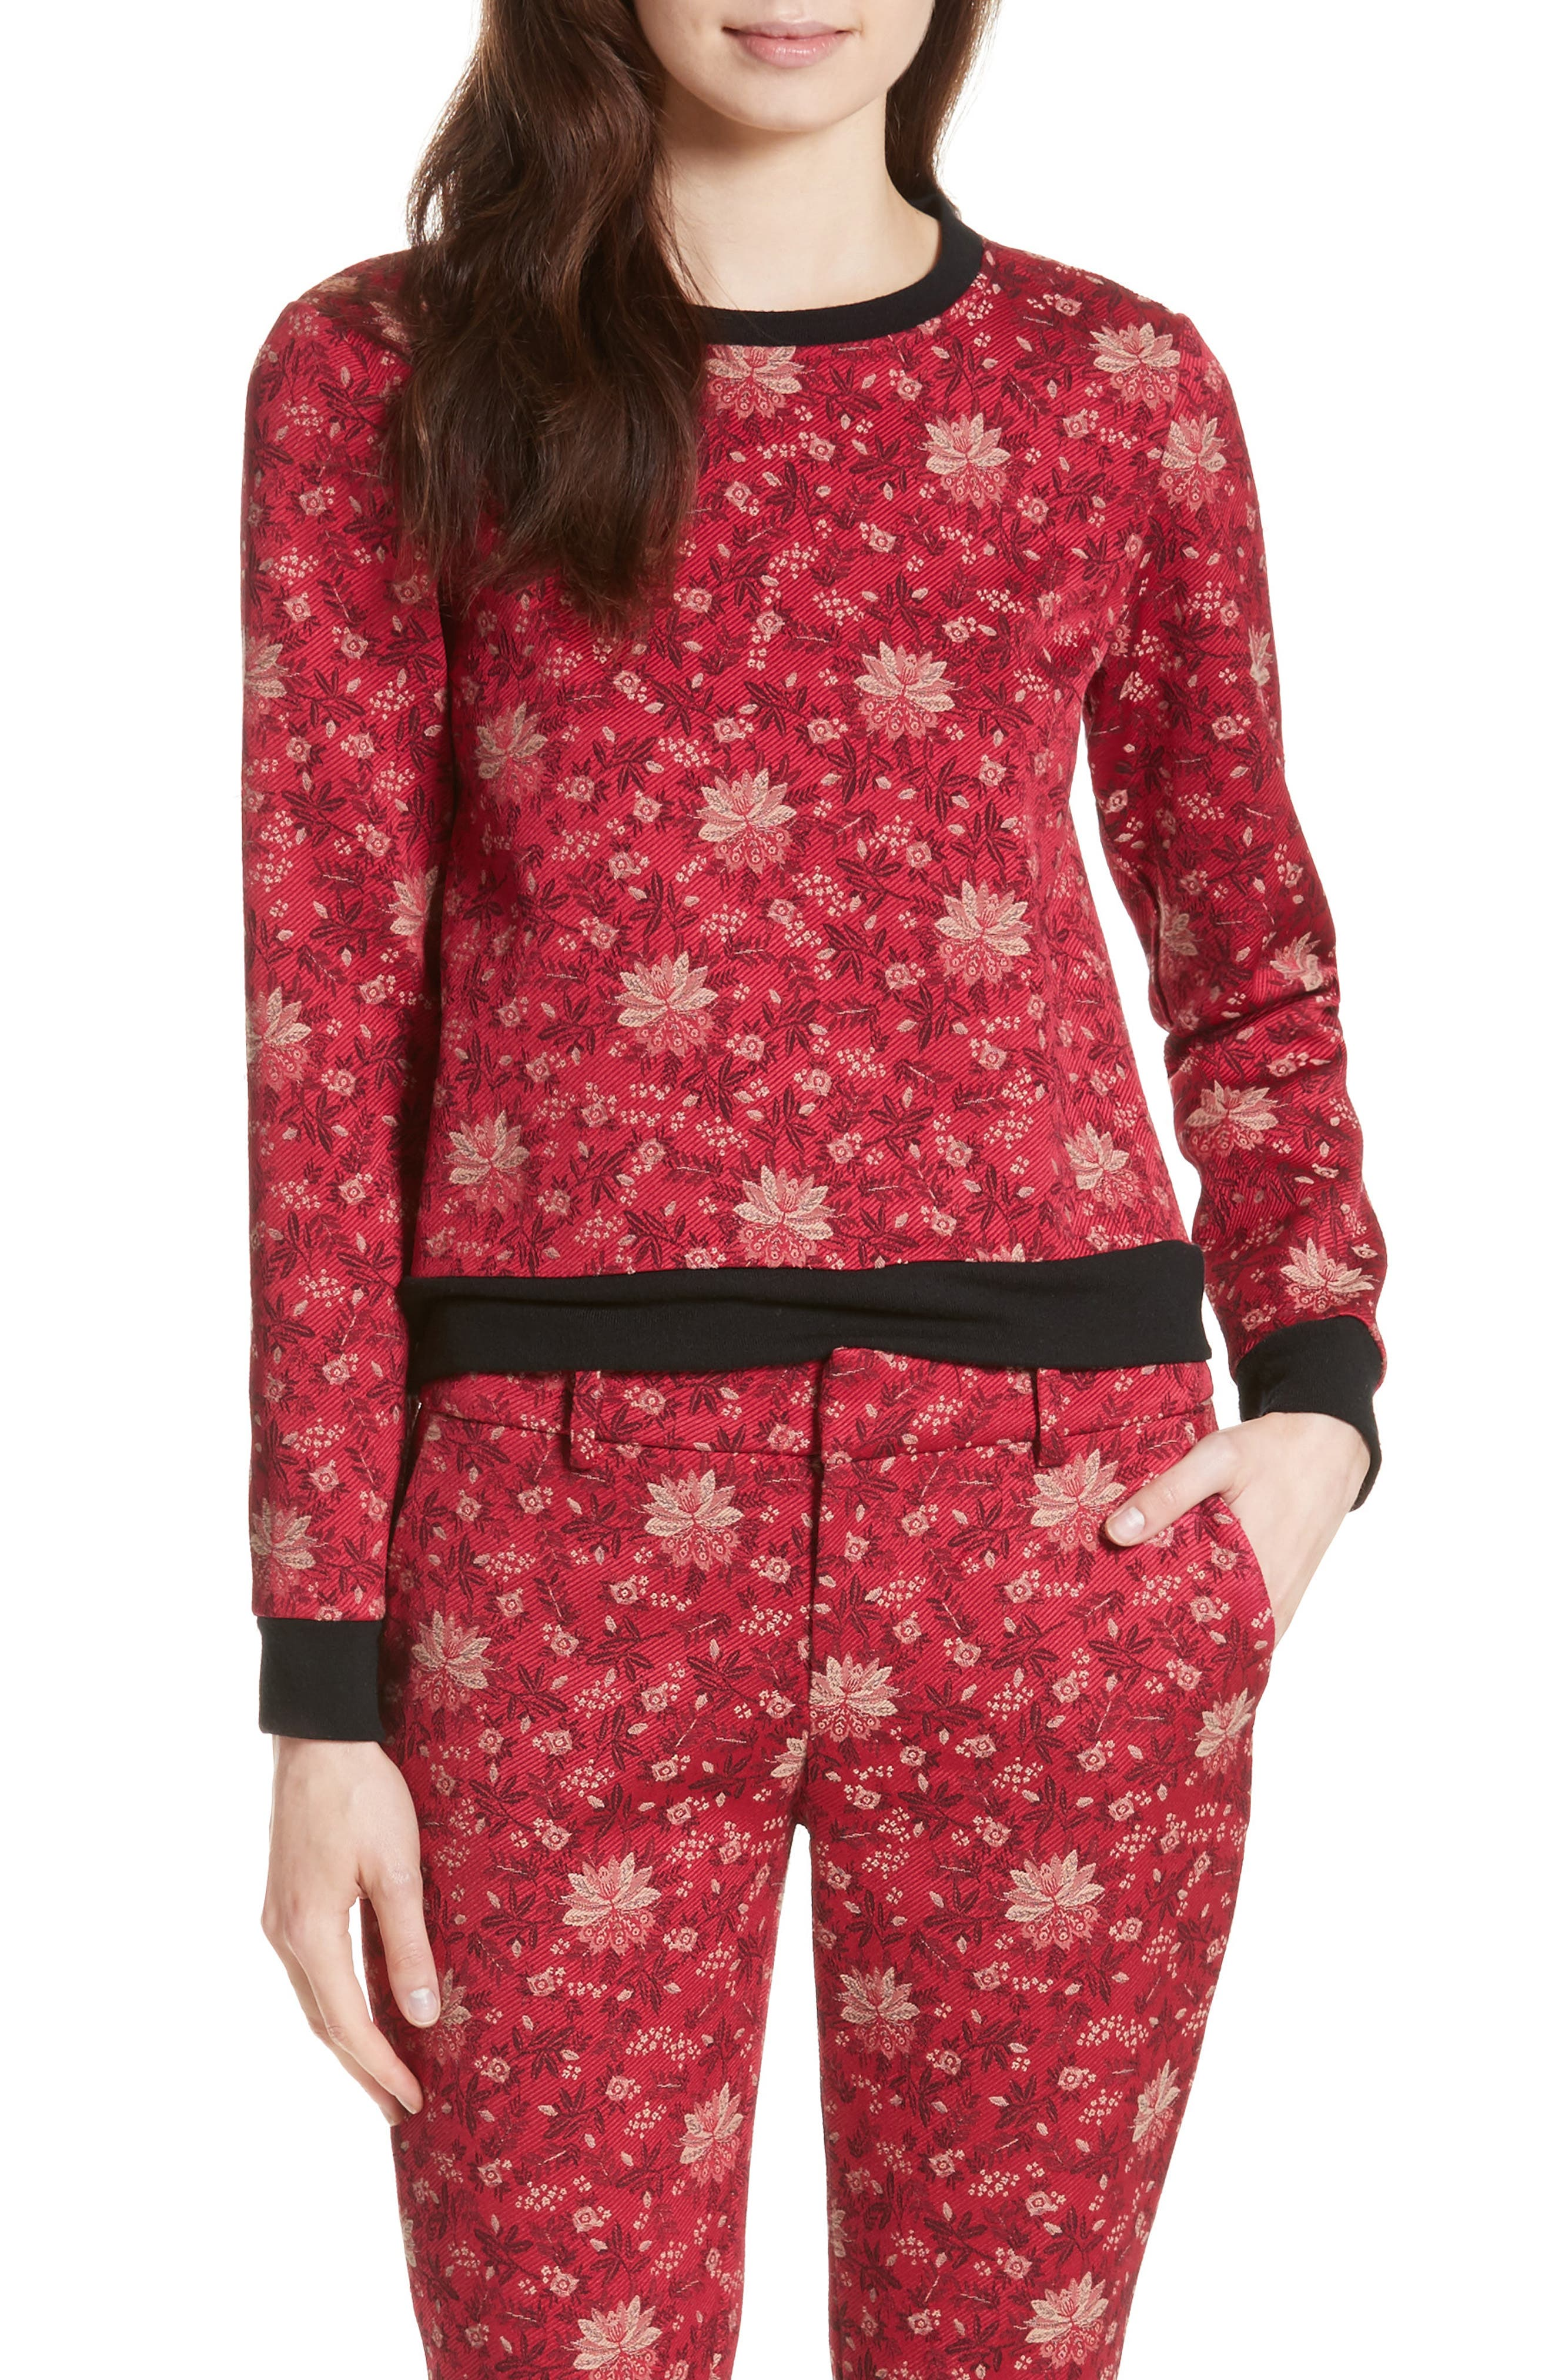 Marylou Floral Jacquard Sweatshirt,                             Main thumbnail 1, color,                             650